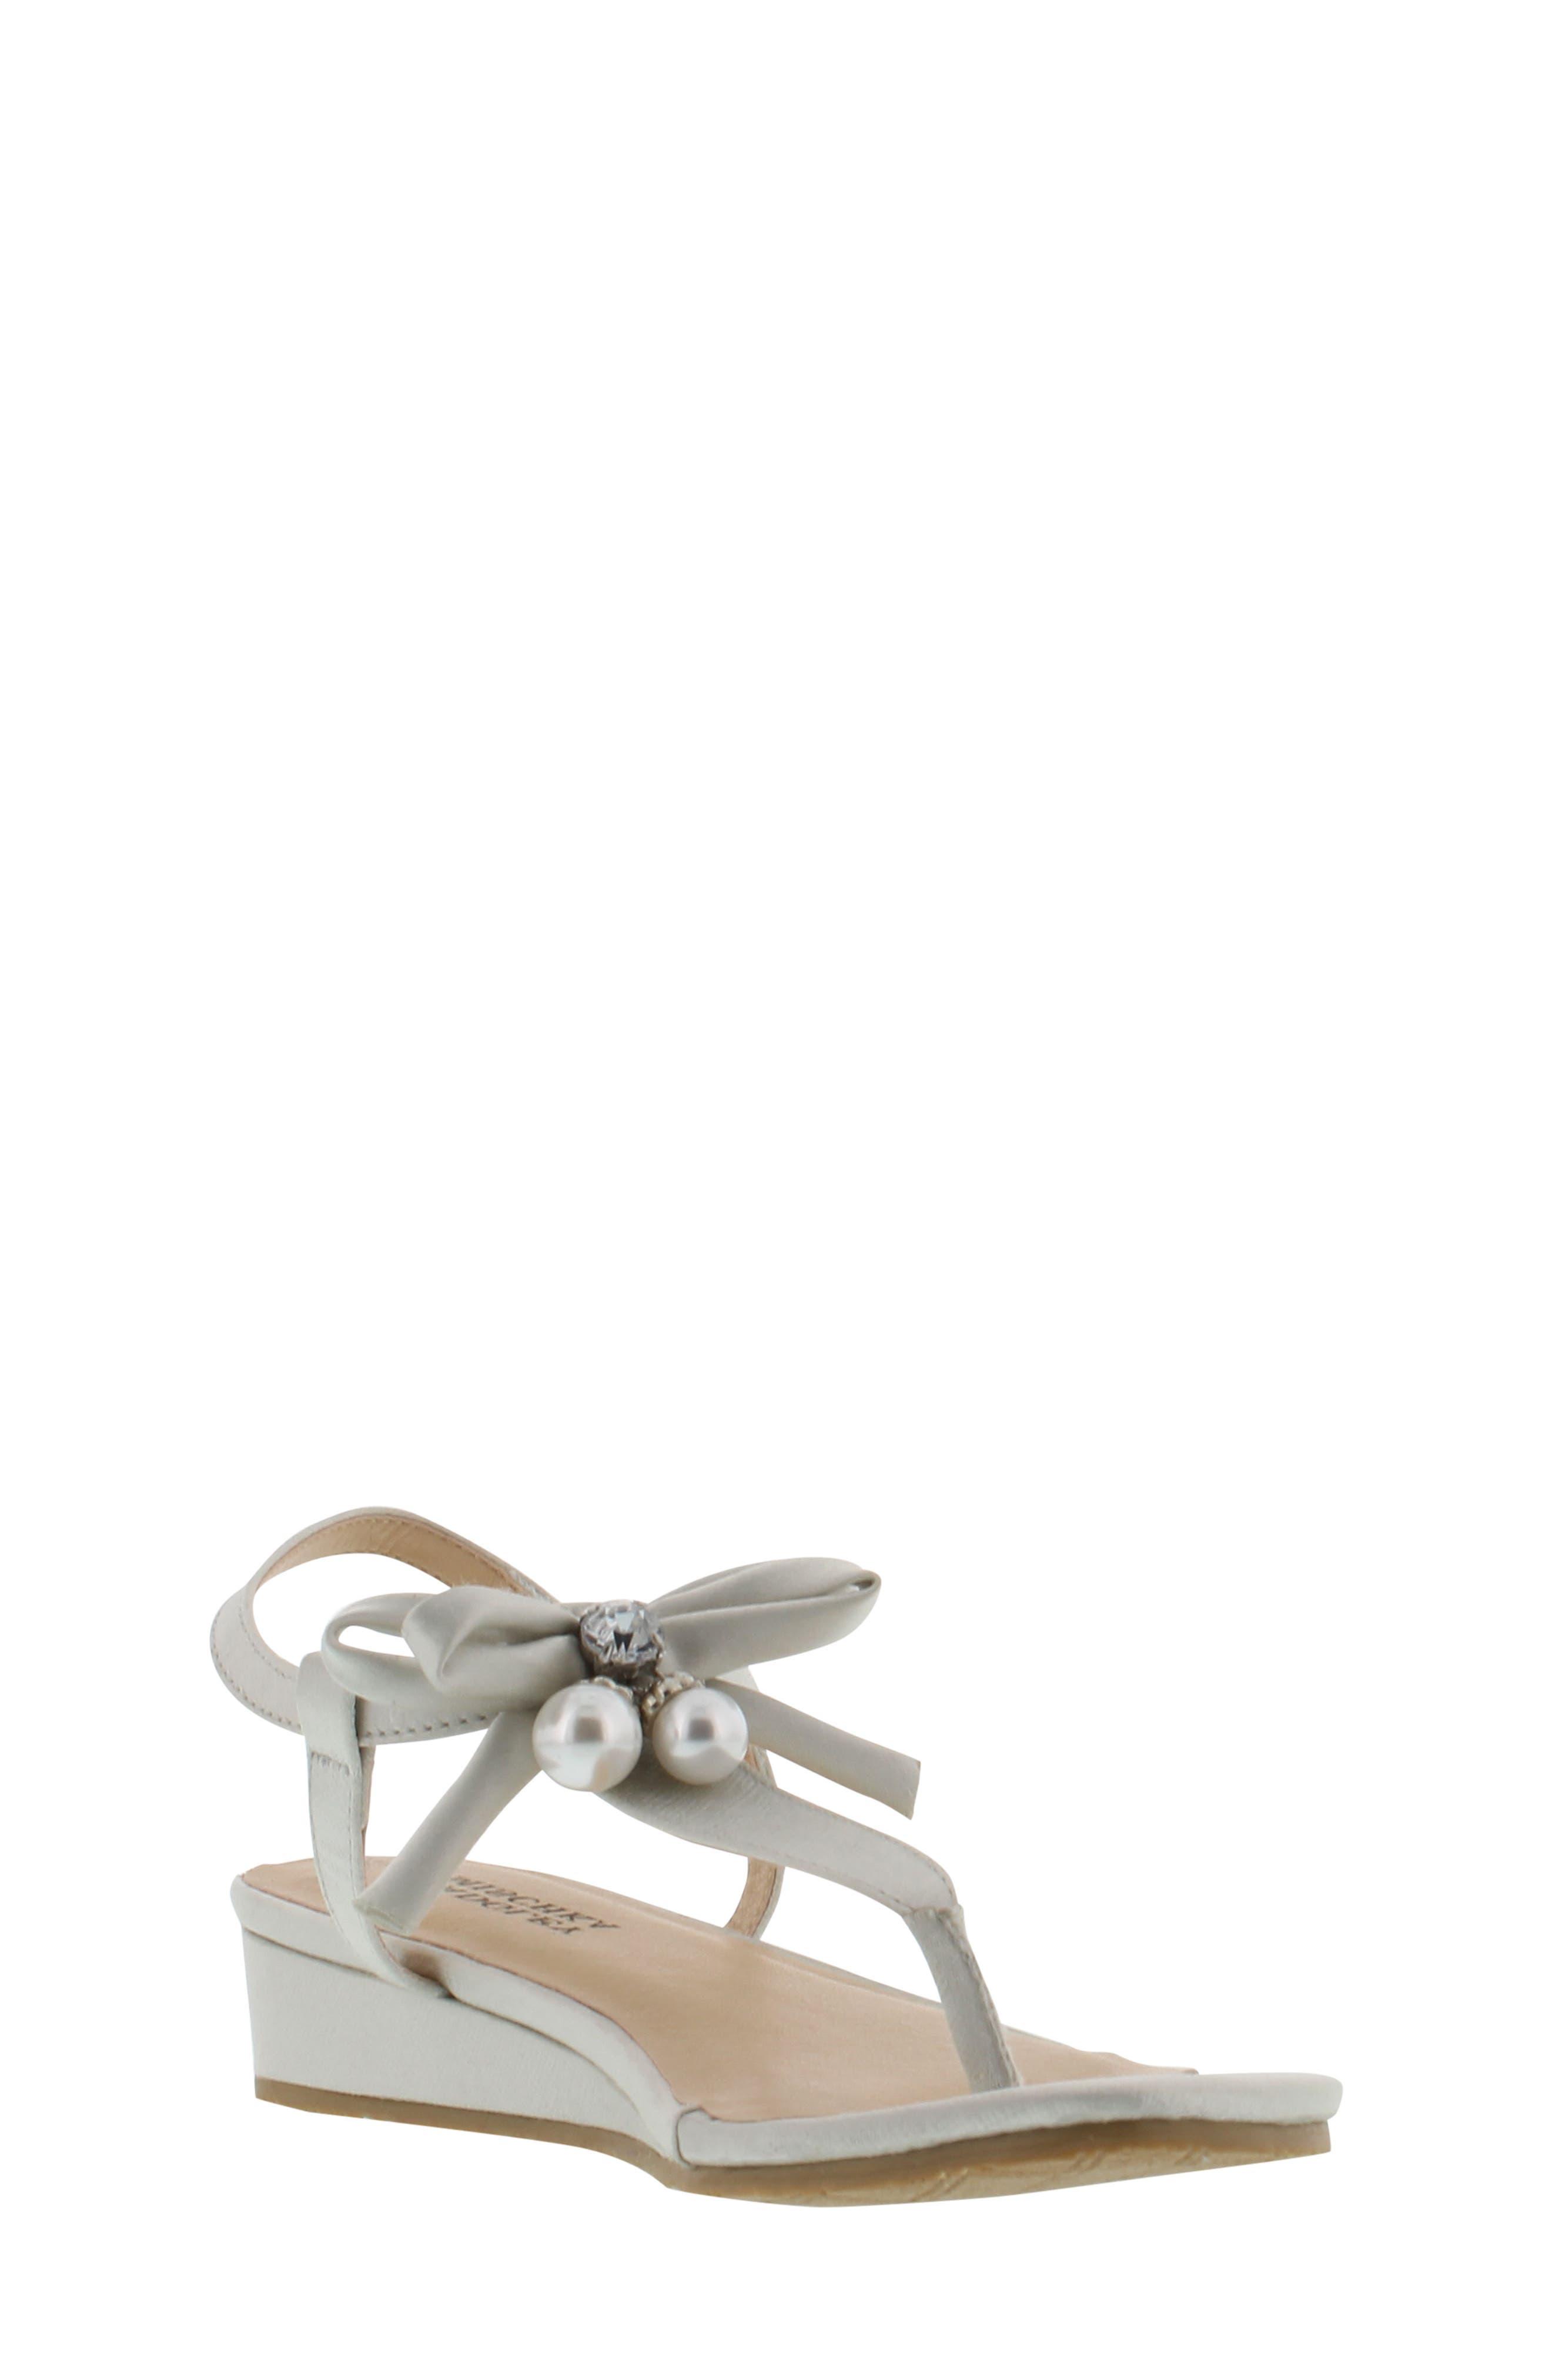 Talia Embellished Bow Sandal,                         Main,                         color, Silver